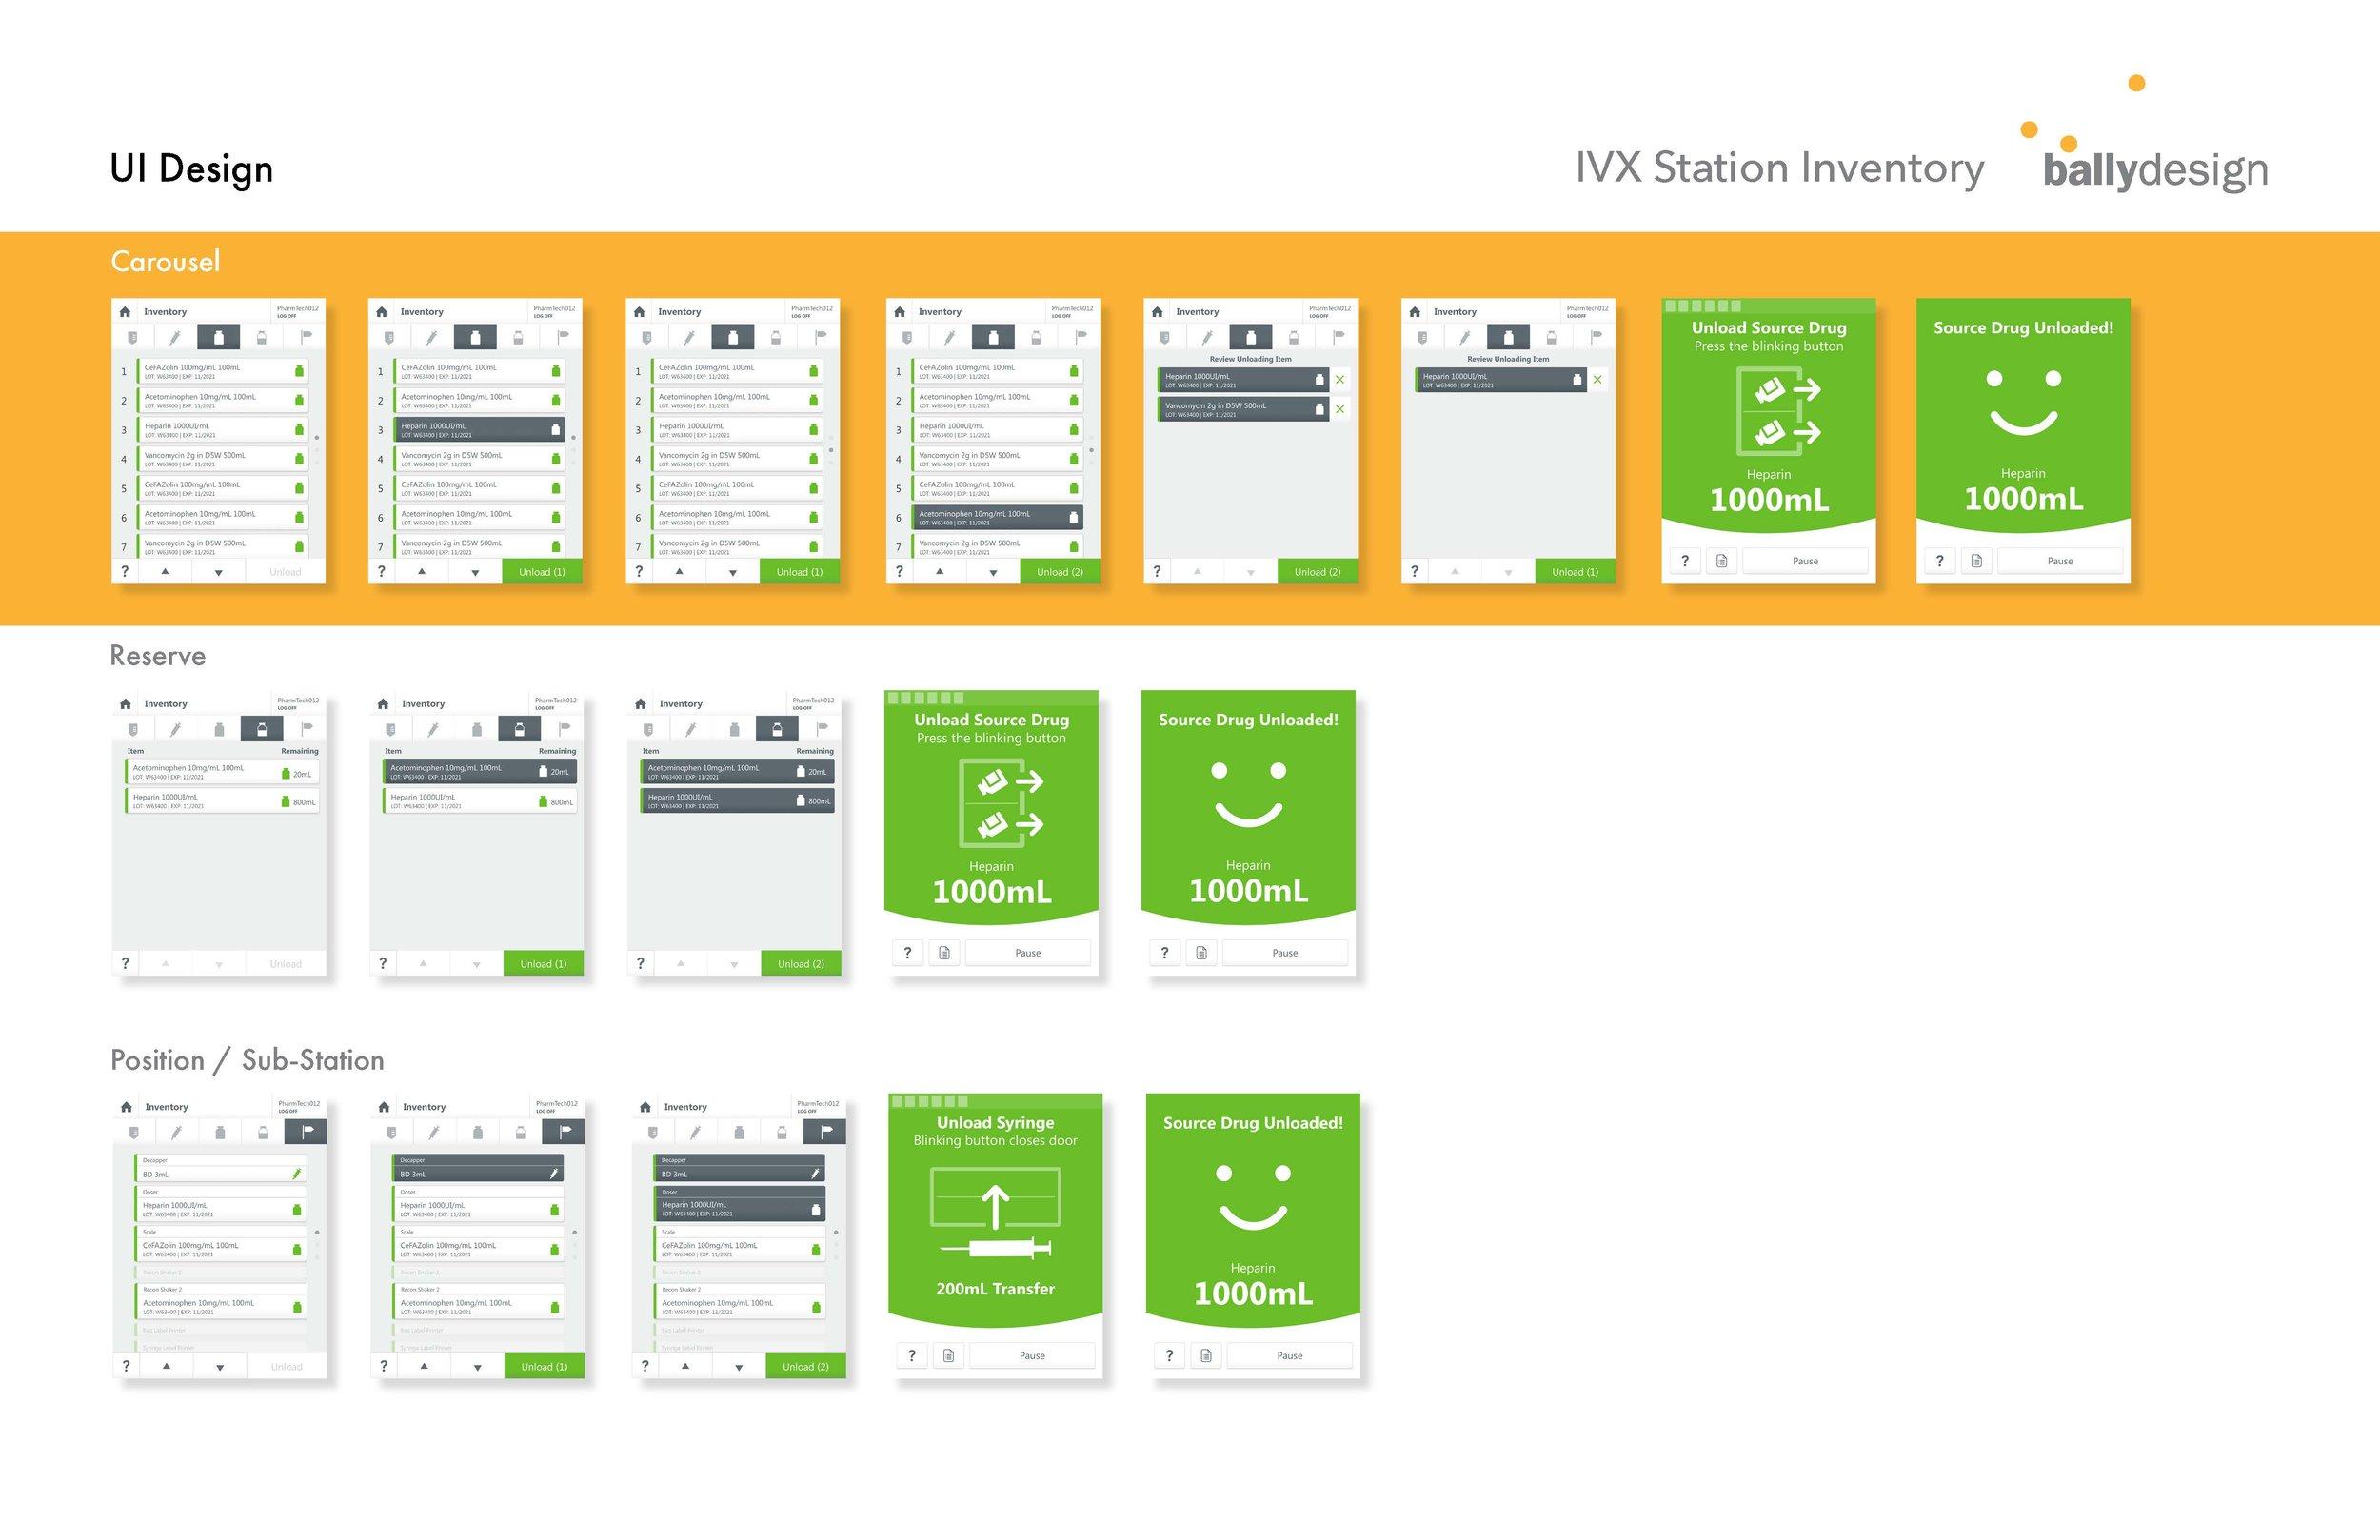 Real_Internship Final Presentation_Page_30.jpg